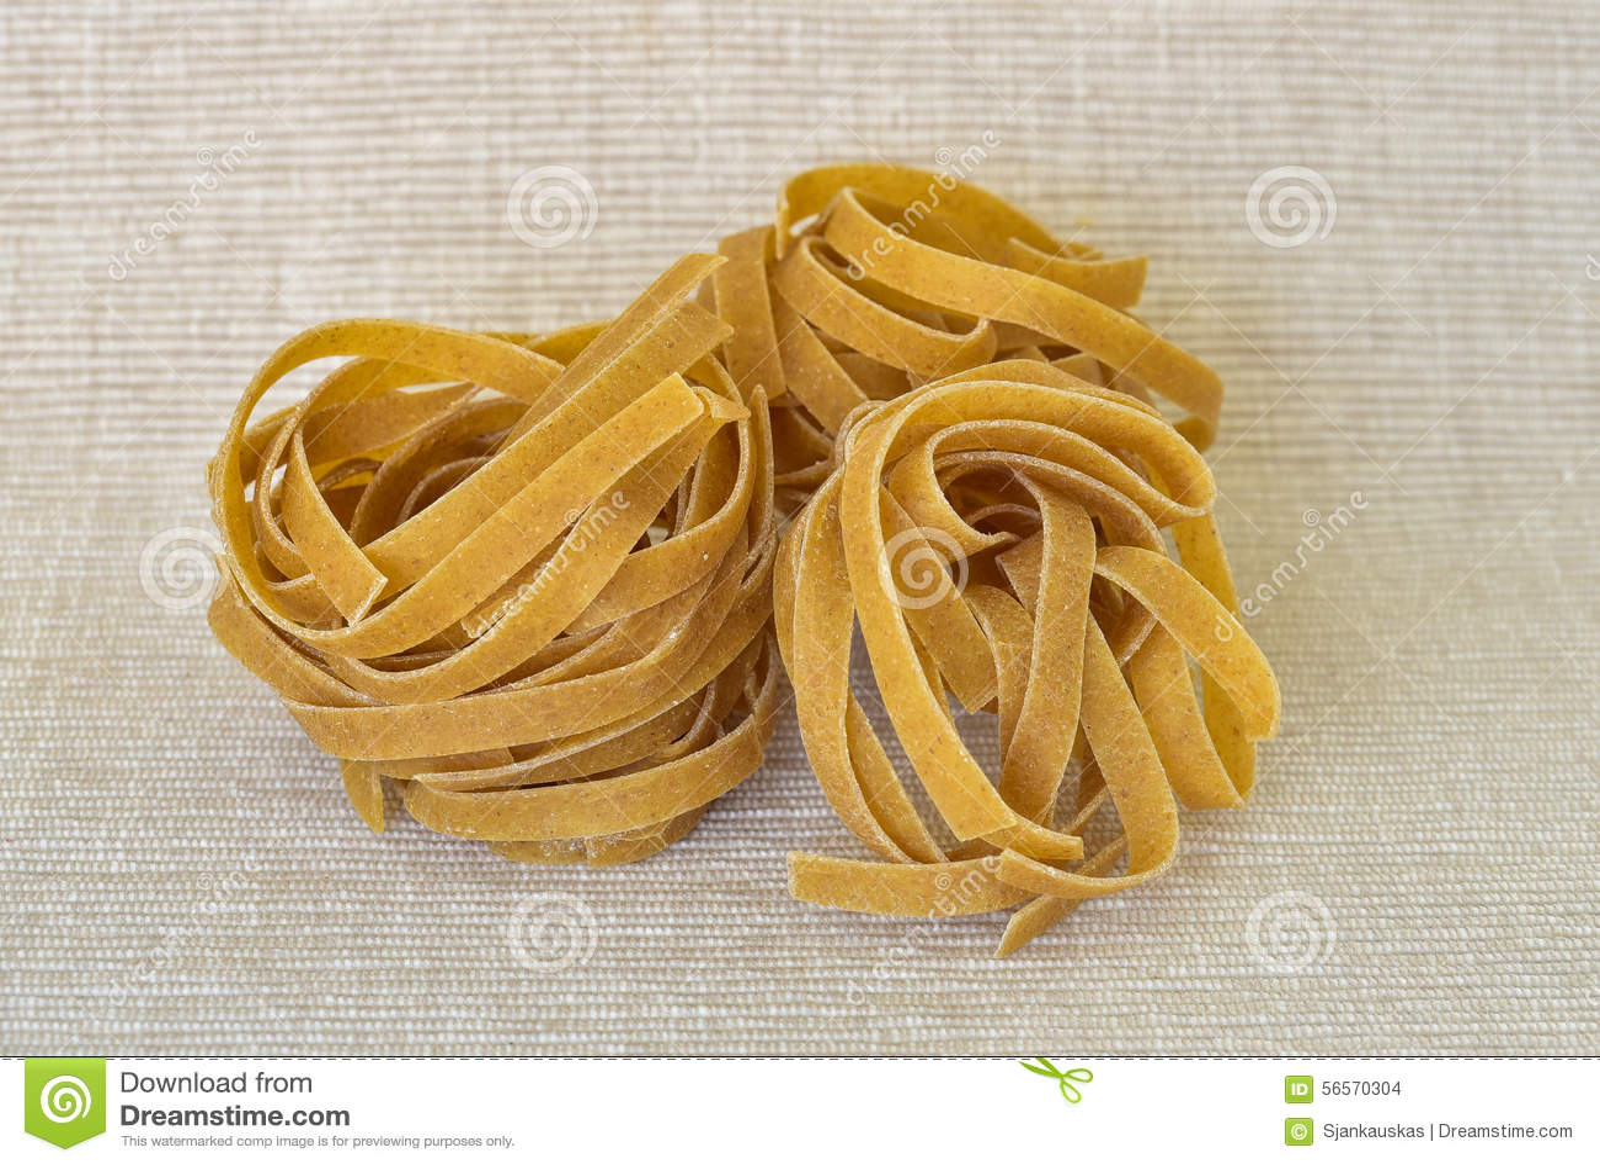 Download σύνολο ζυμαρικών σιταρι&omic Στοκ Εικόνες - εικόνα από υδατάνθρακας, μαγείρεμα: 56570304